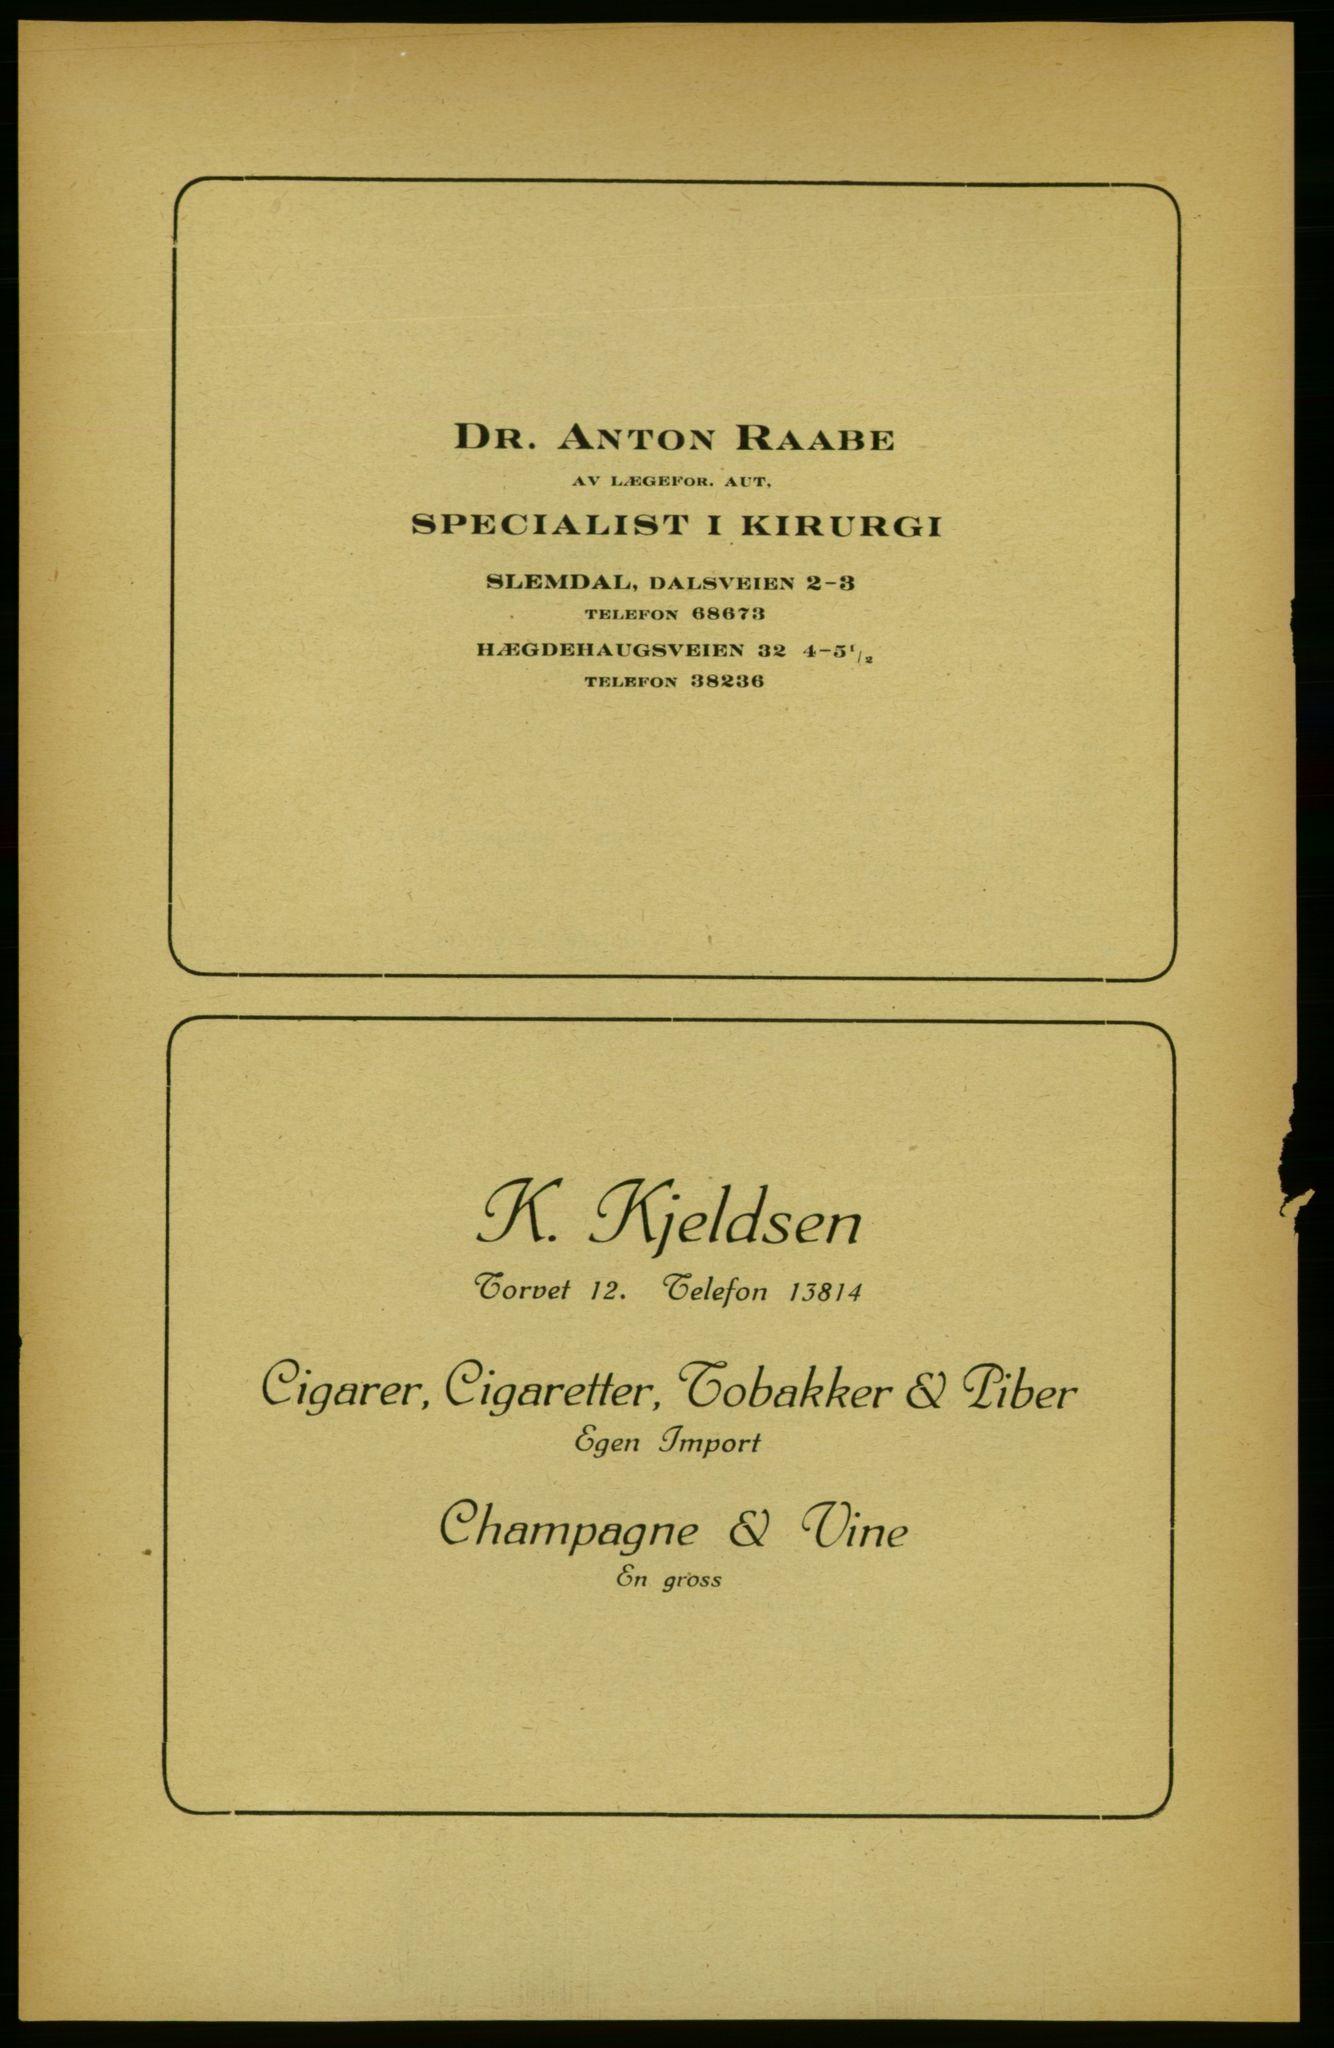 RA, Aker adressebok/adressekalender (publikasjon)*, 1922, p. 12